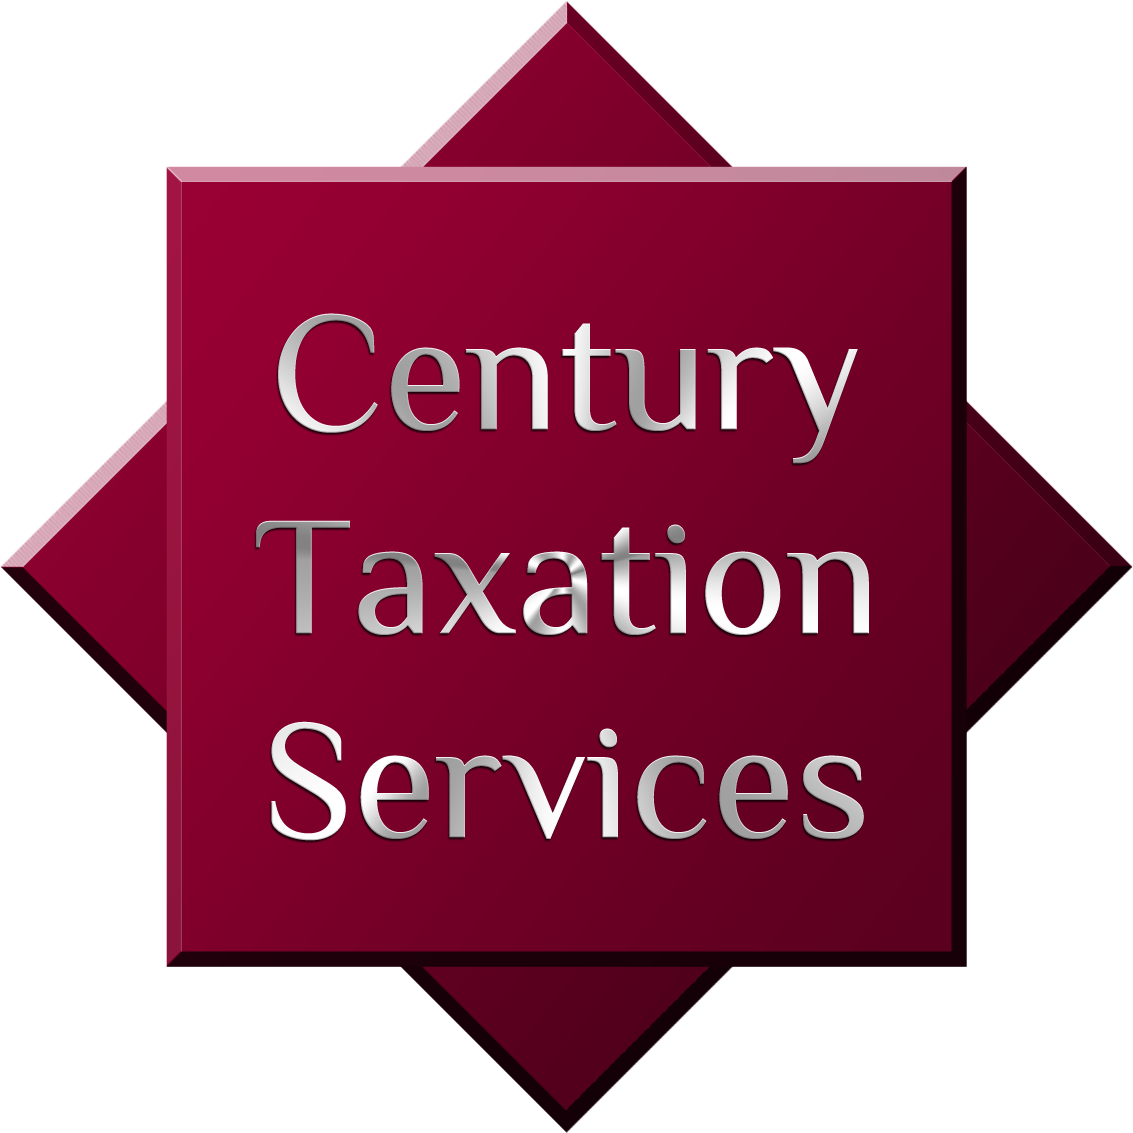 Century Taxation Services